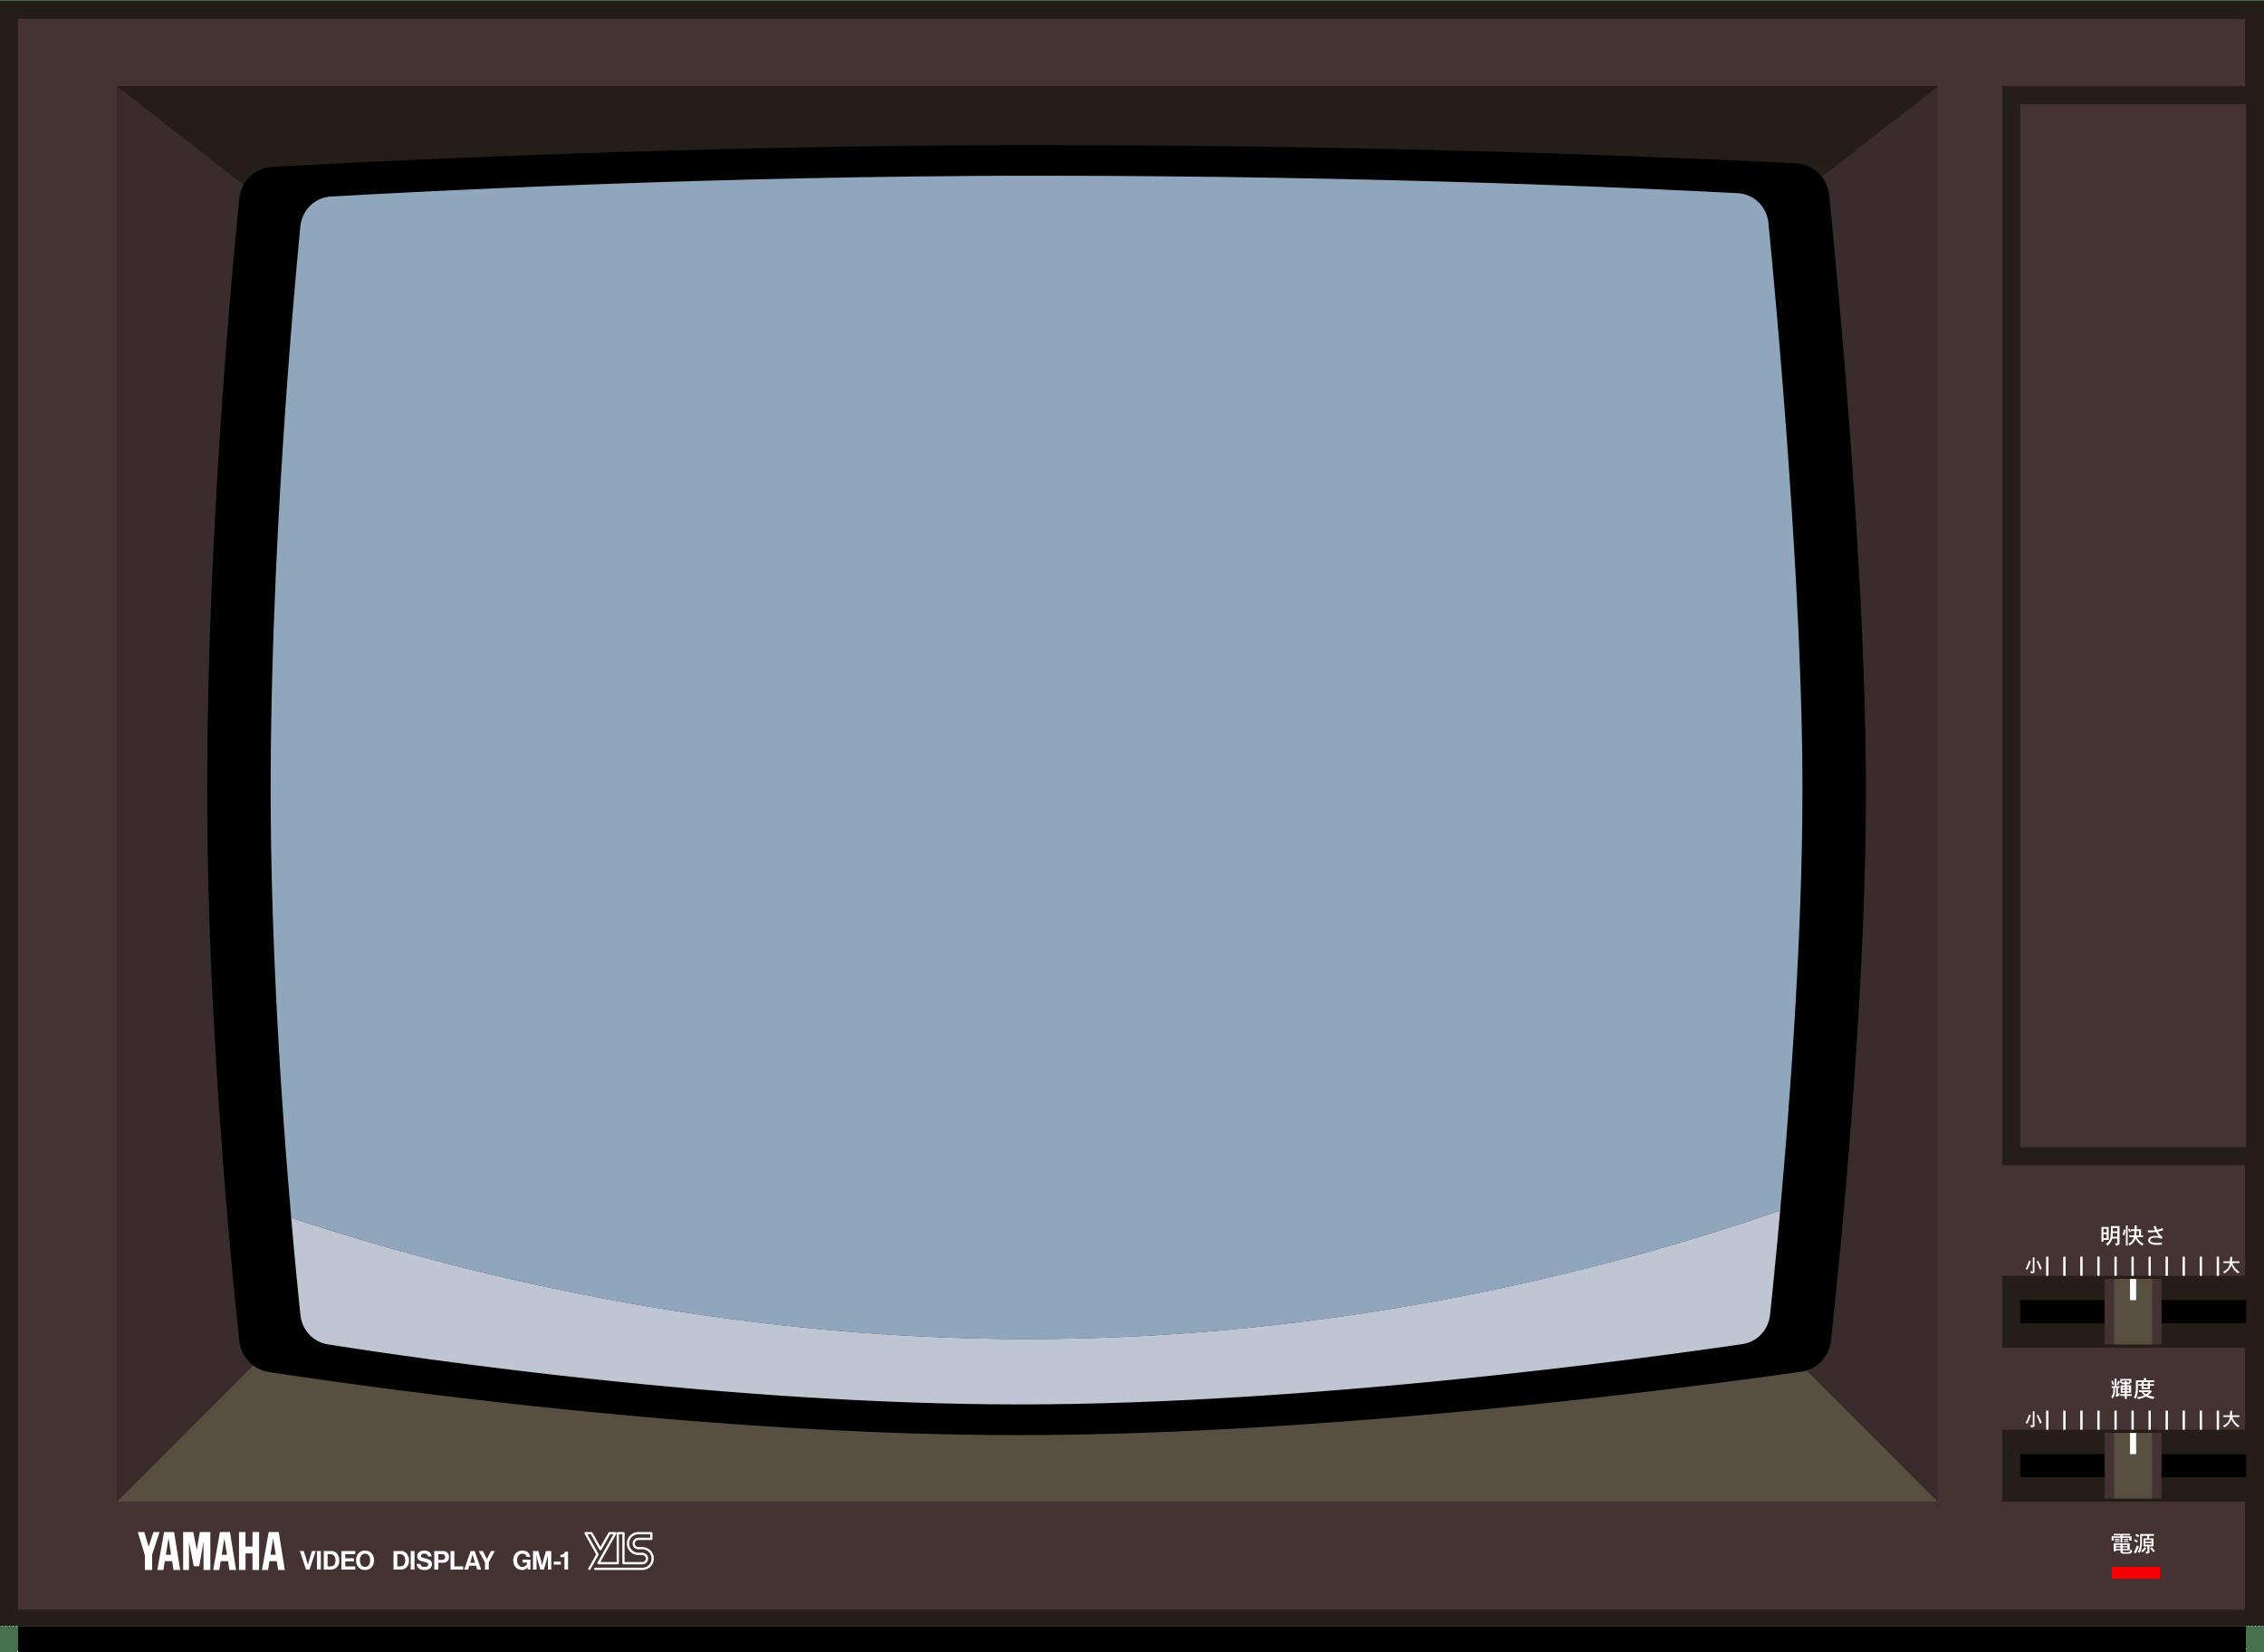 Yamaha YIS GM1 CRT monitor